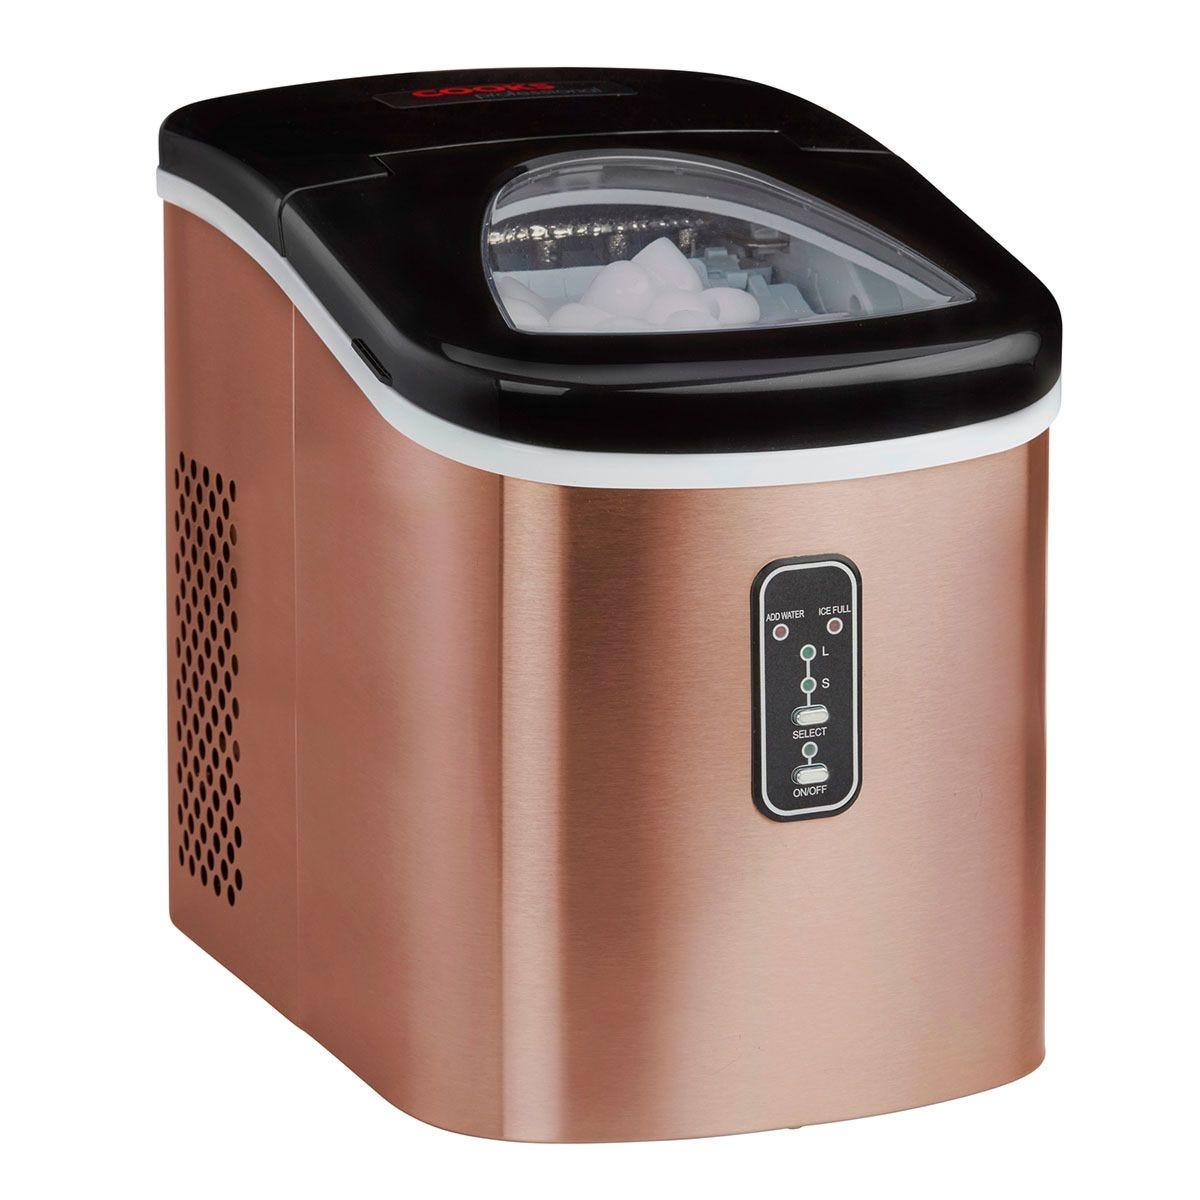 Cooks Professional G3471 Automatic 2.2L Ice Maker – Copper